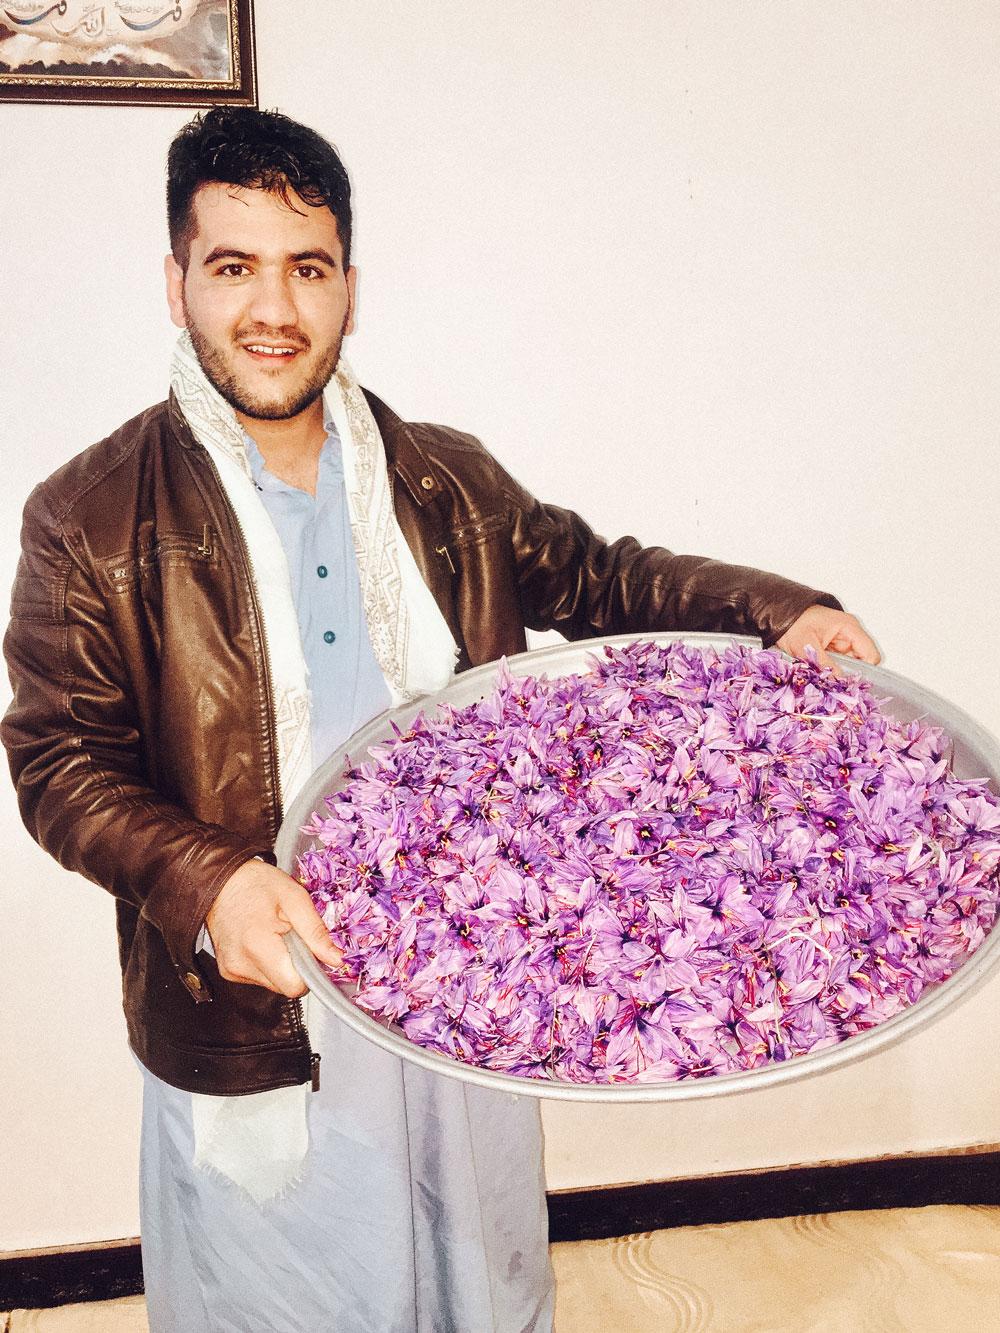 Mohammad Salehi holding a large bowl of Crocus Satvis flowers.